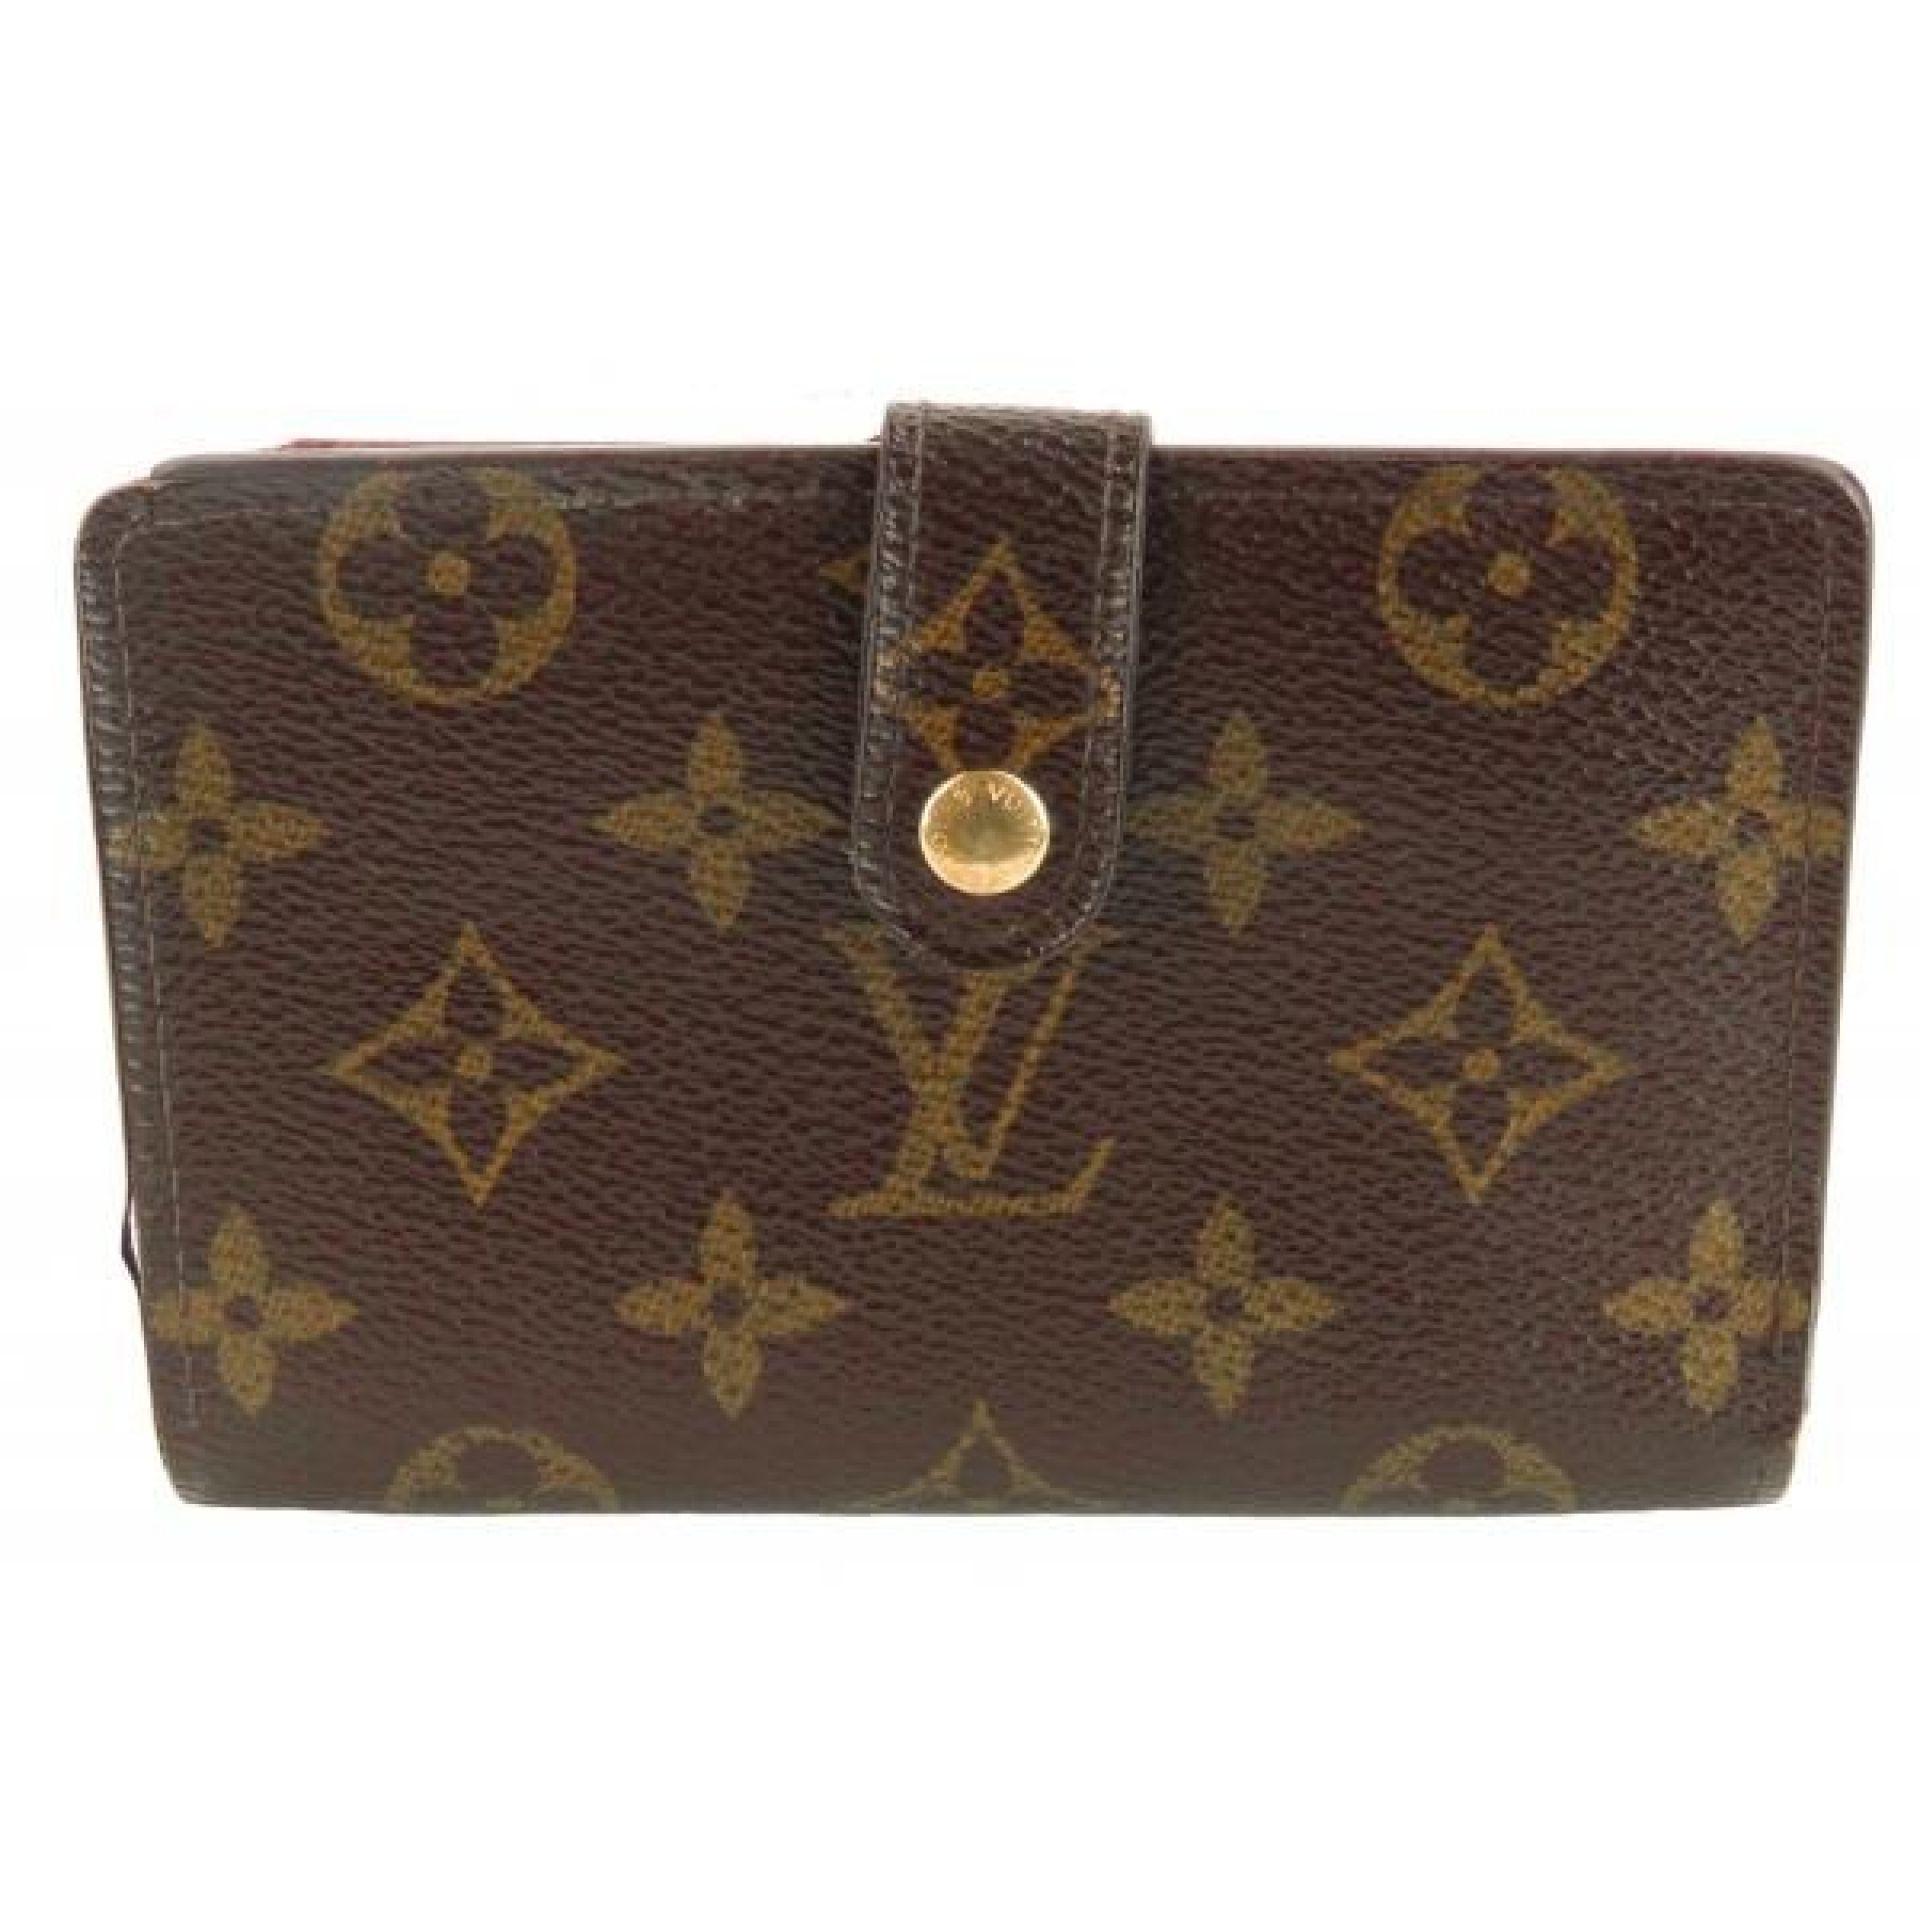 Louis Vuitton Brown Monogram Canvas Kisslock Bifold Compact Wallet